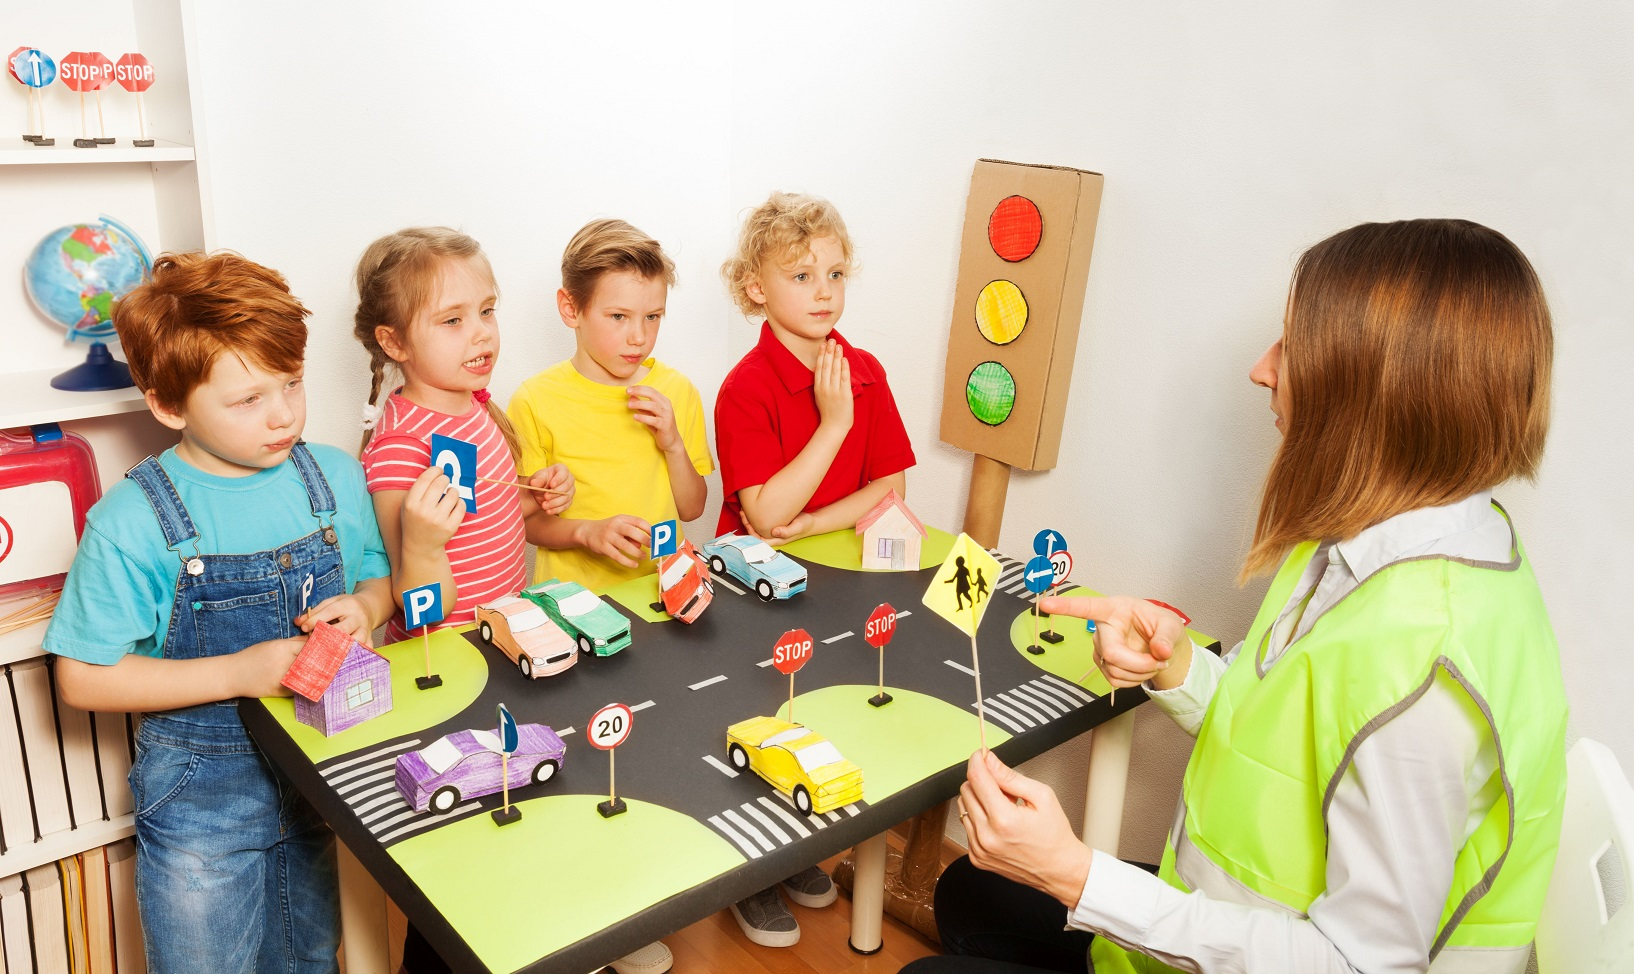 veilig in het verkeer, verkeersverontreiniging, kindnorm verkeer